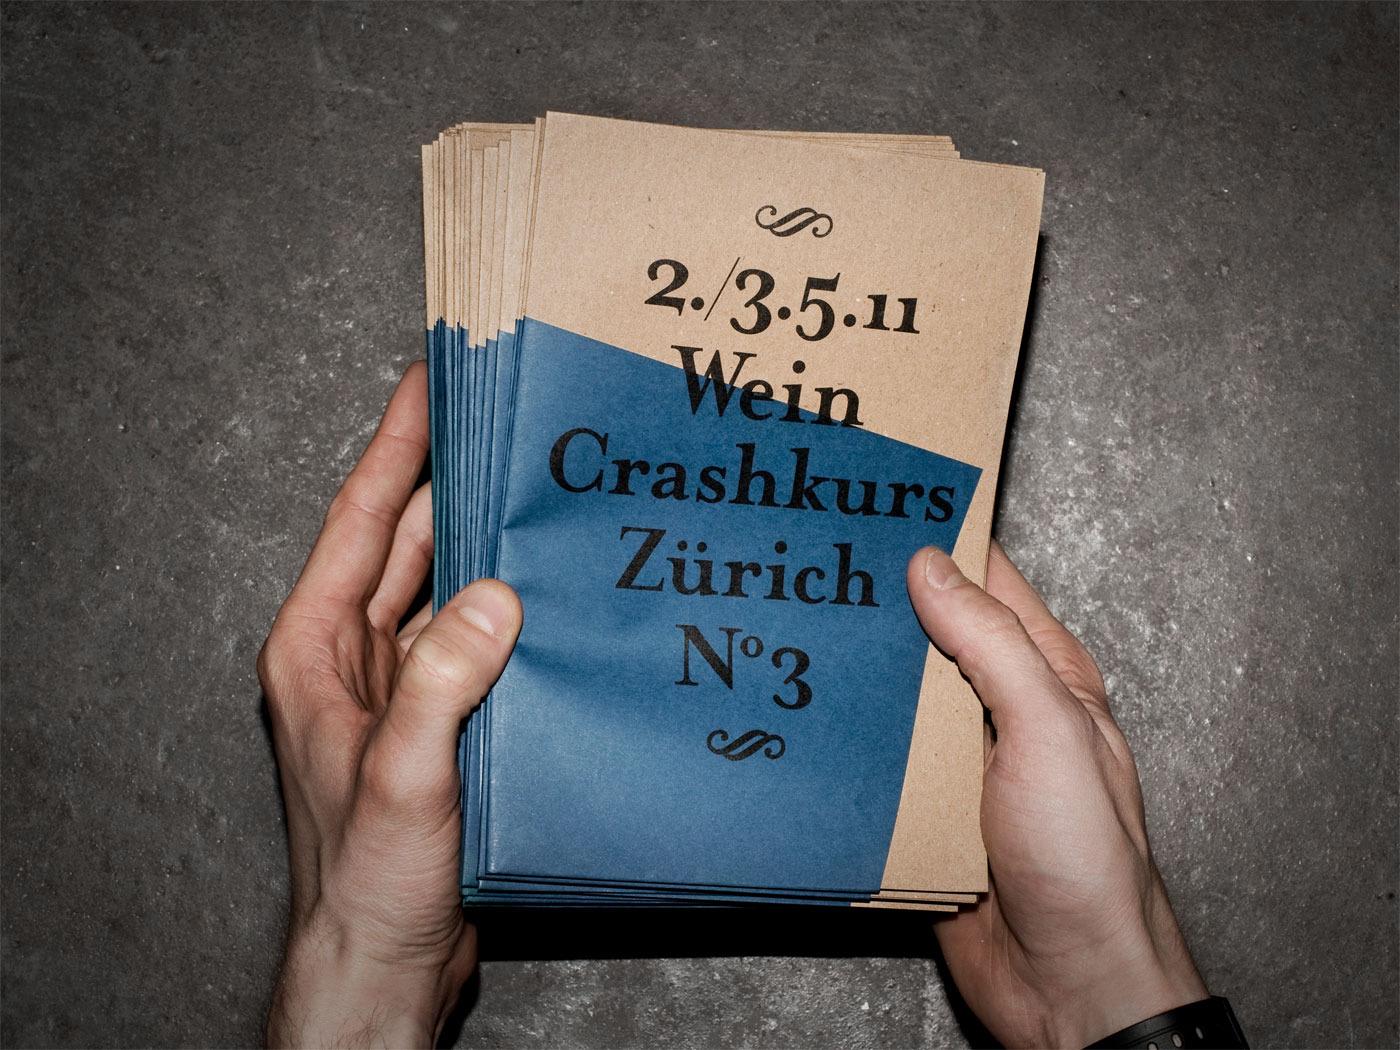 Bureau Collective – Wein Crashkurs